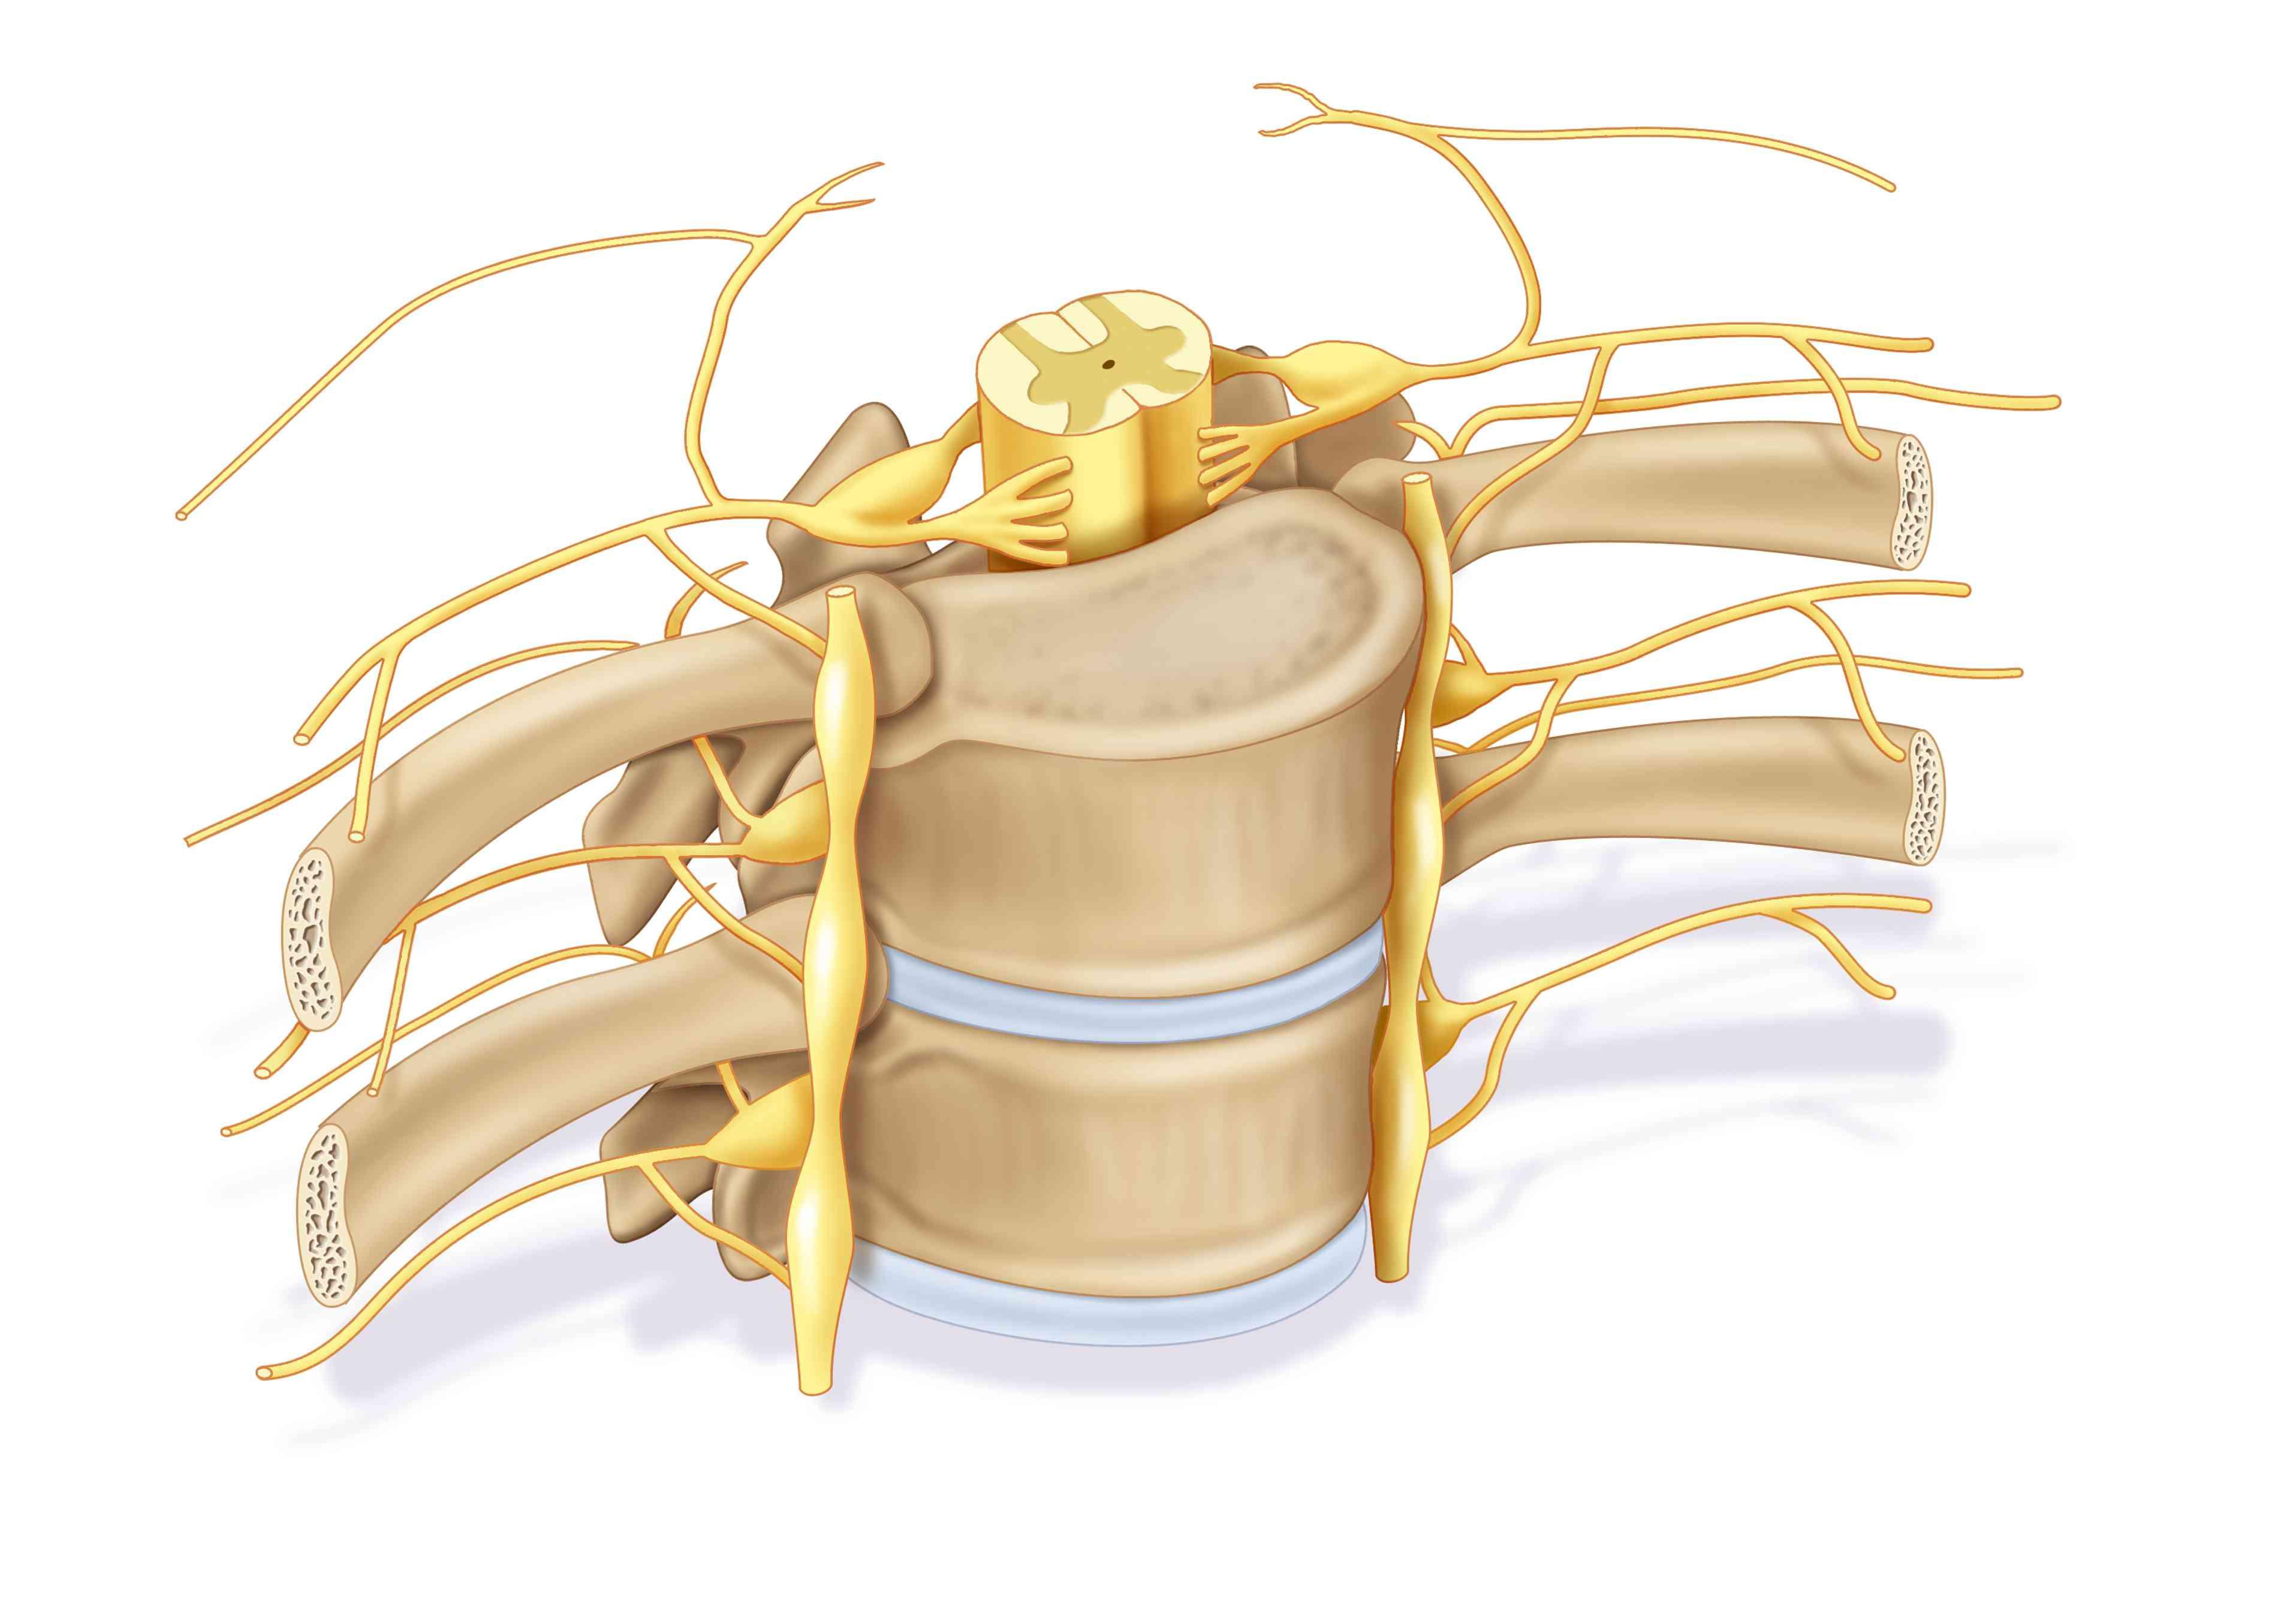 Spinal column, illustration